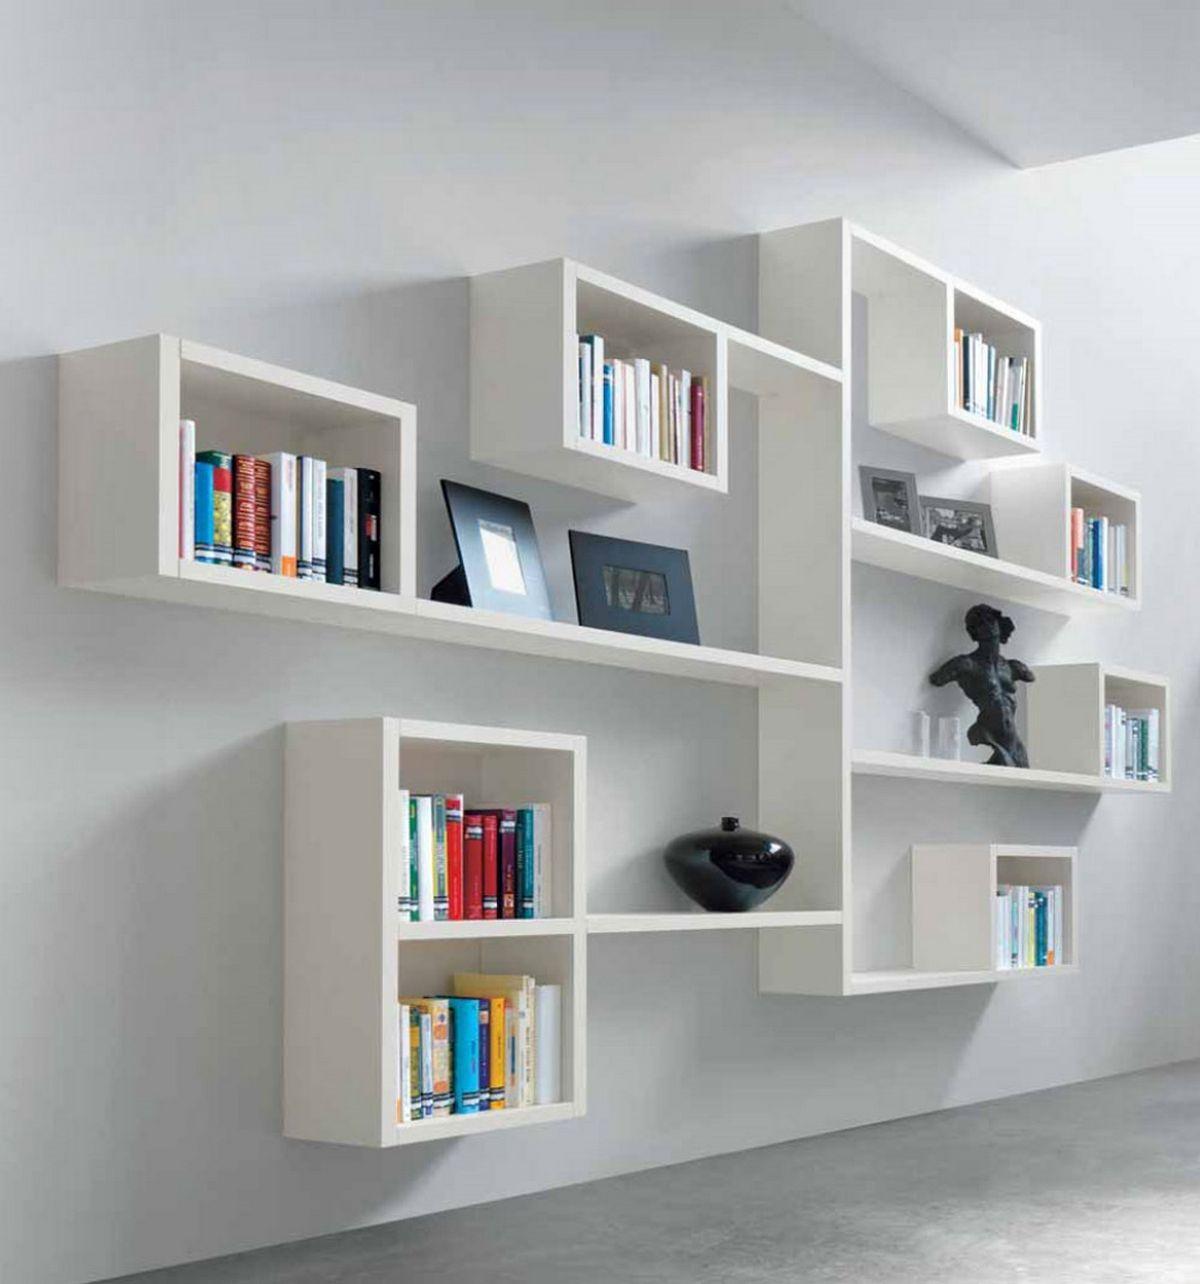 wall bookshelf art display 1st floor: creative alternative, combination shelving, and  shadow OXUJNOD